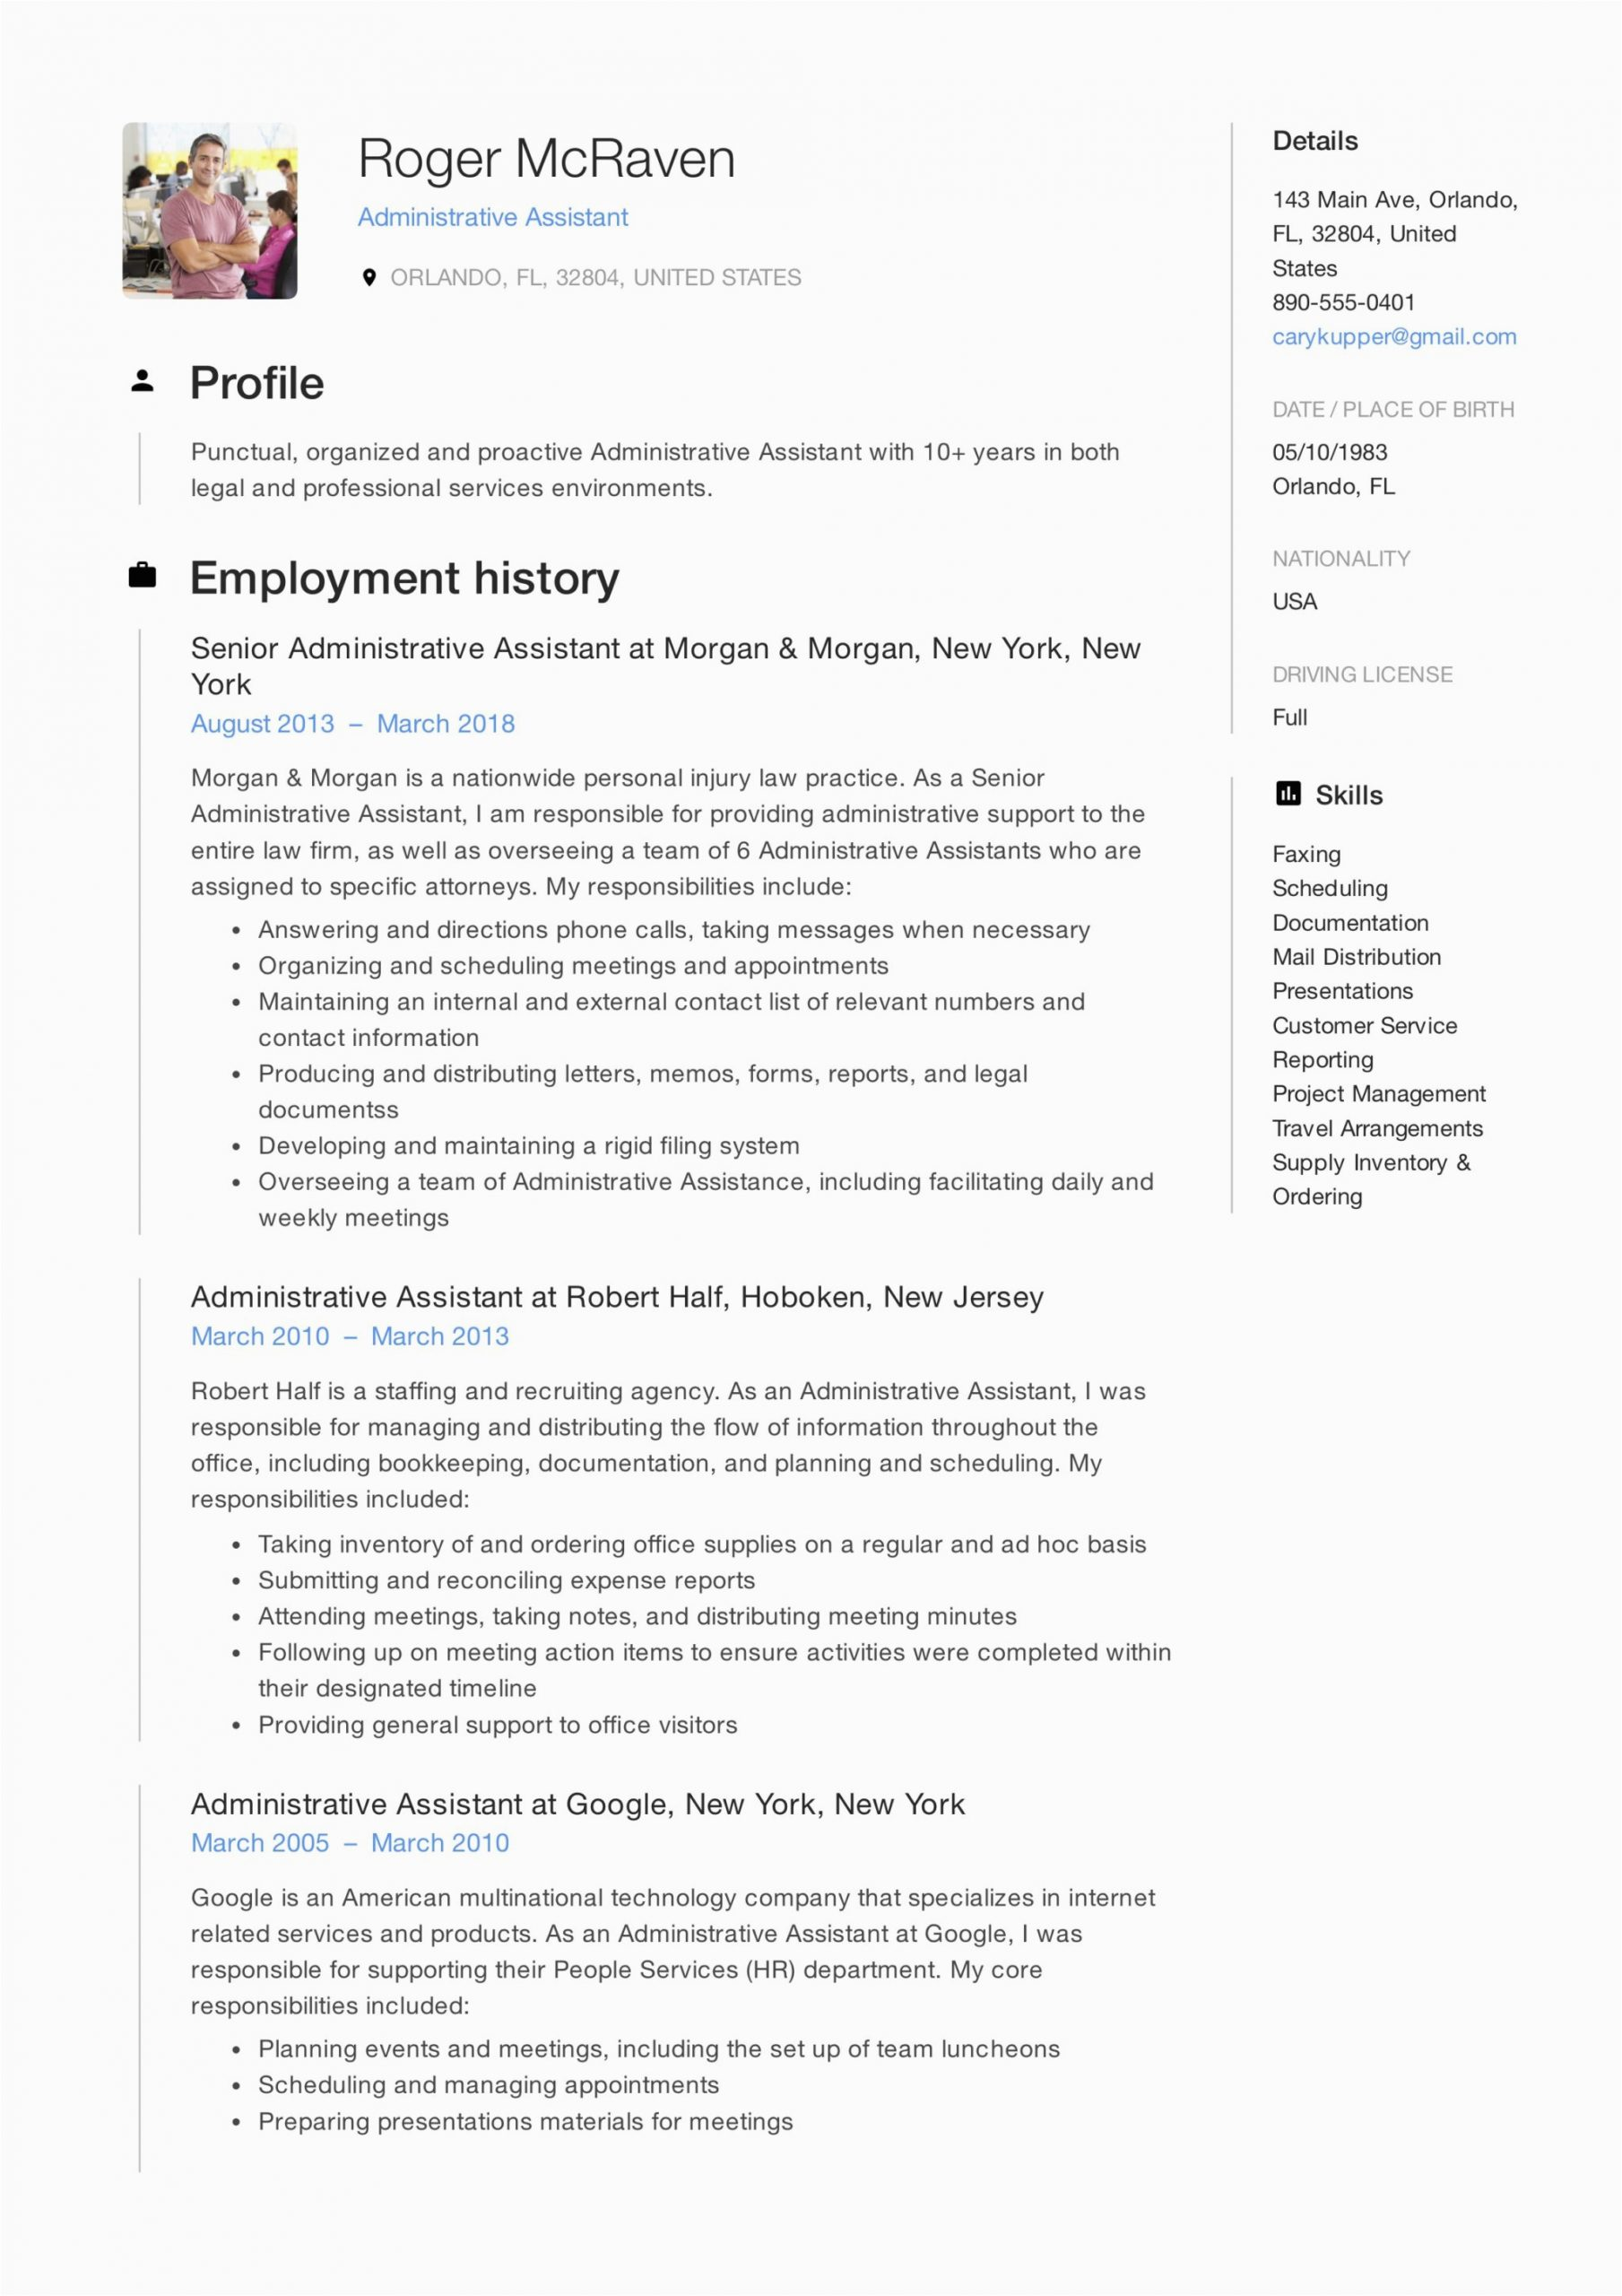 Sample Resume for Administrative assistant Pdf Full Guide Administrative assistant Resume [ 12 Samples